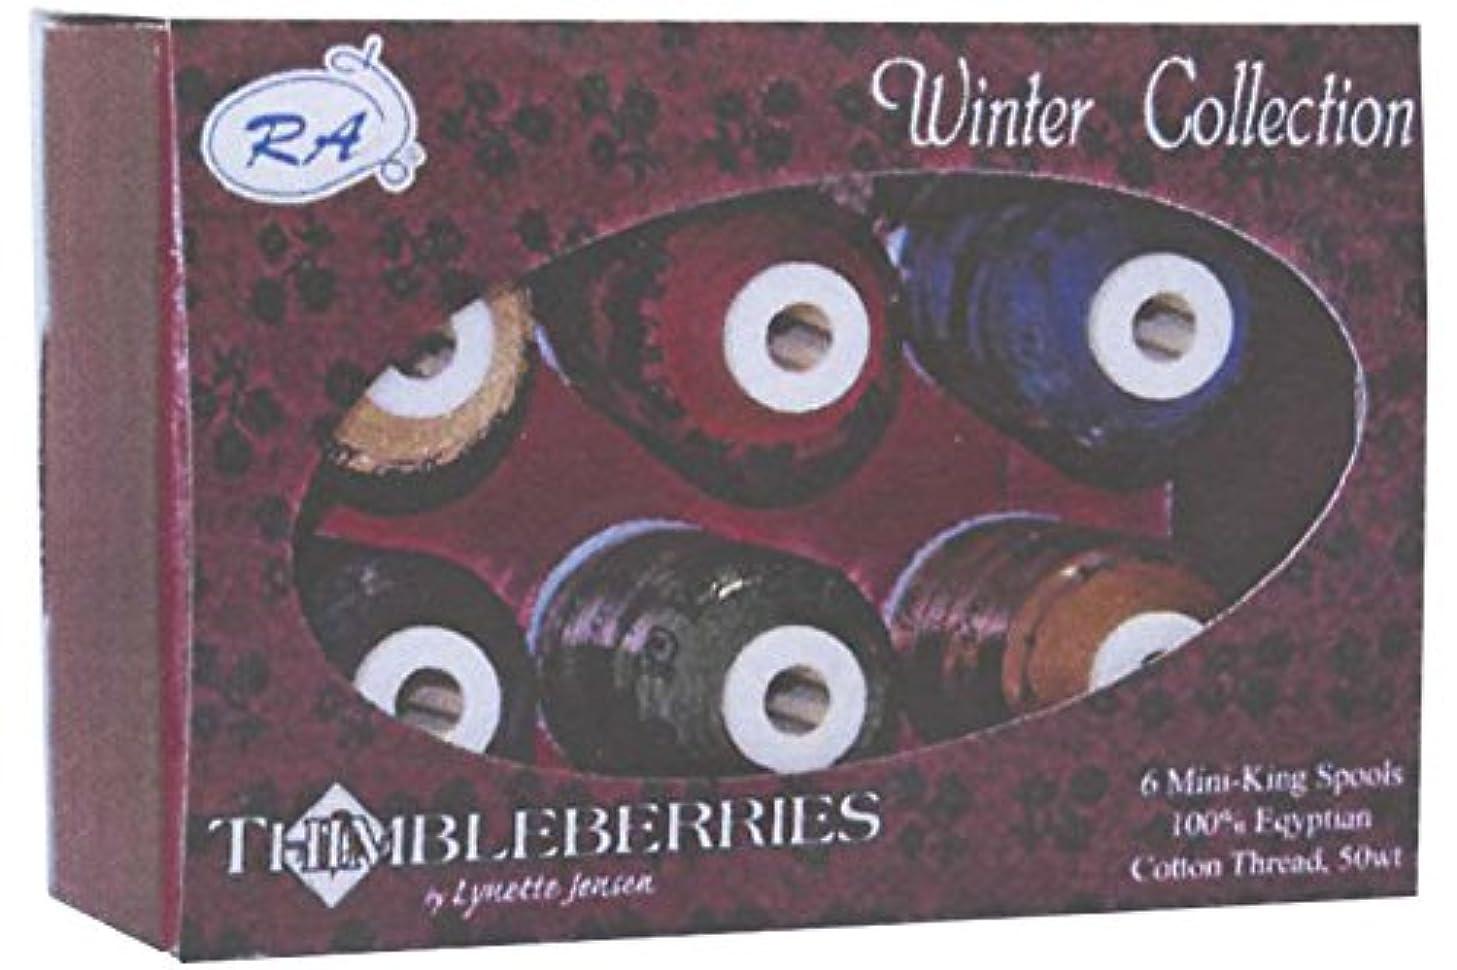 Robison-Anton Thimbleberries 6-Pack Cotton Thread Collection, Winter